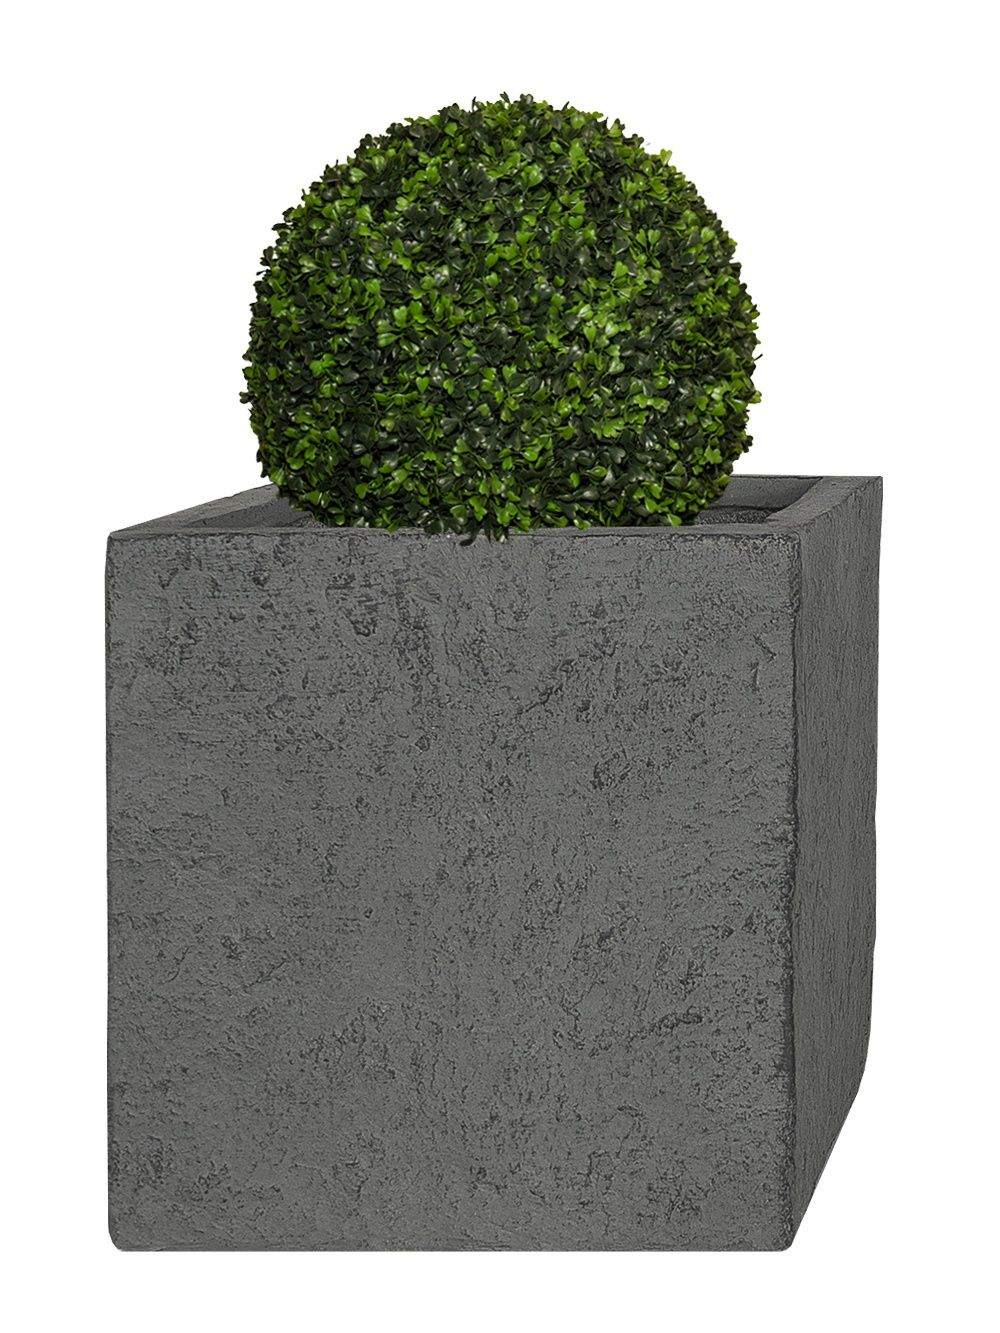 pflanzkübel cube - (lava grau) - 45cm x 55cm x 55cm | garten